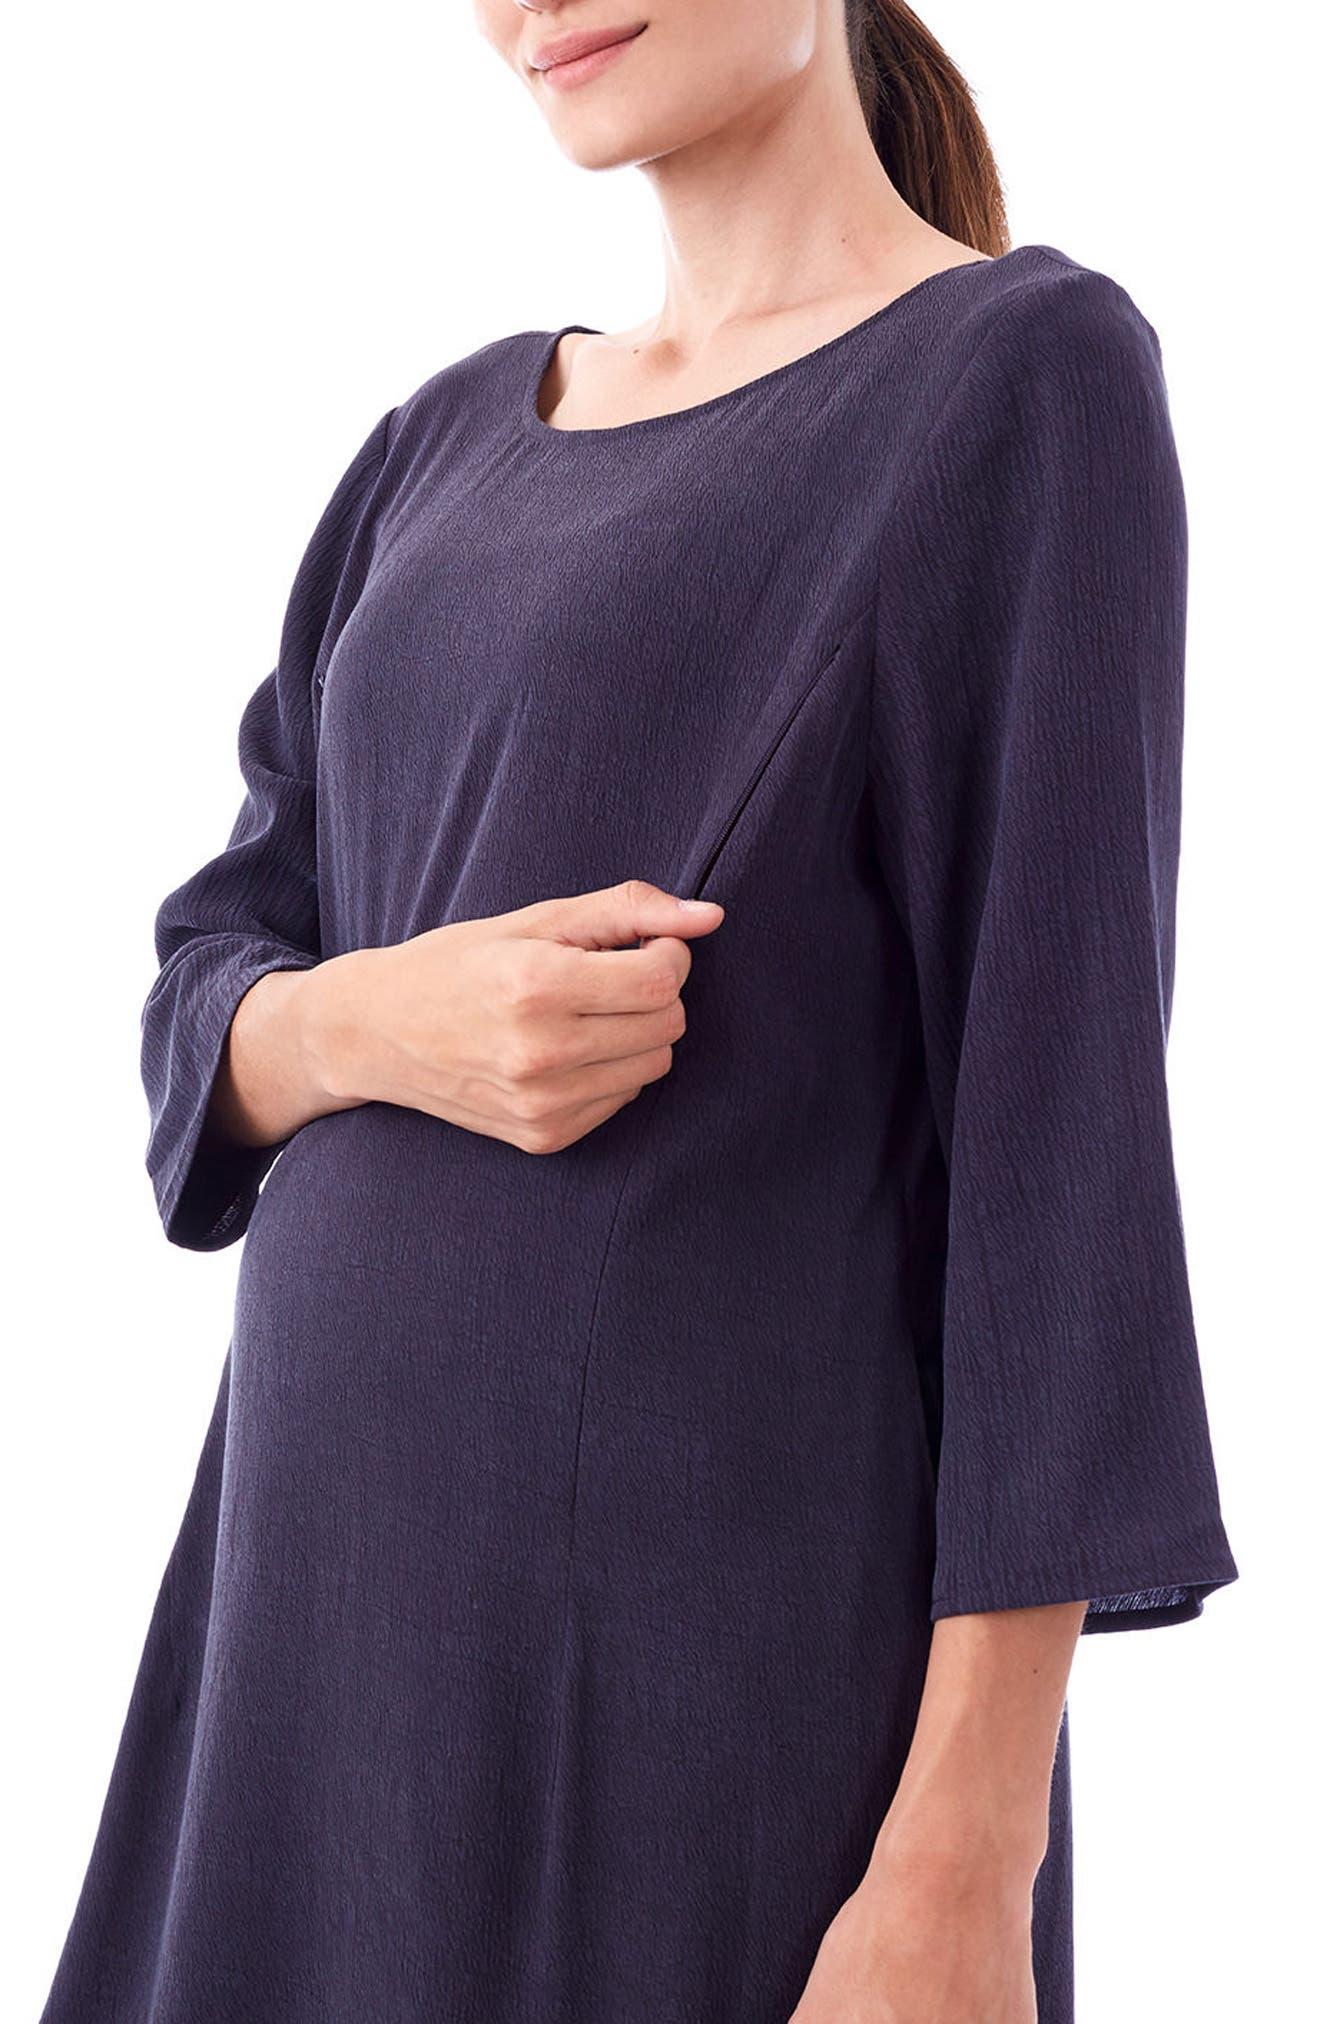 Layla Maternity/Nursing Dress,                             Alternate thumbnail 3, color,                             CHARCOAL